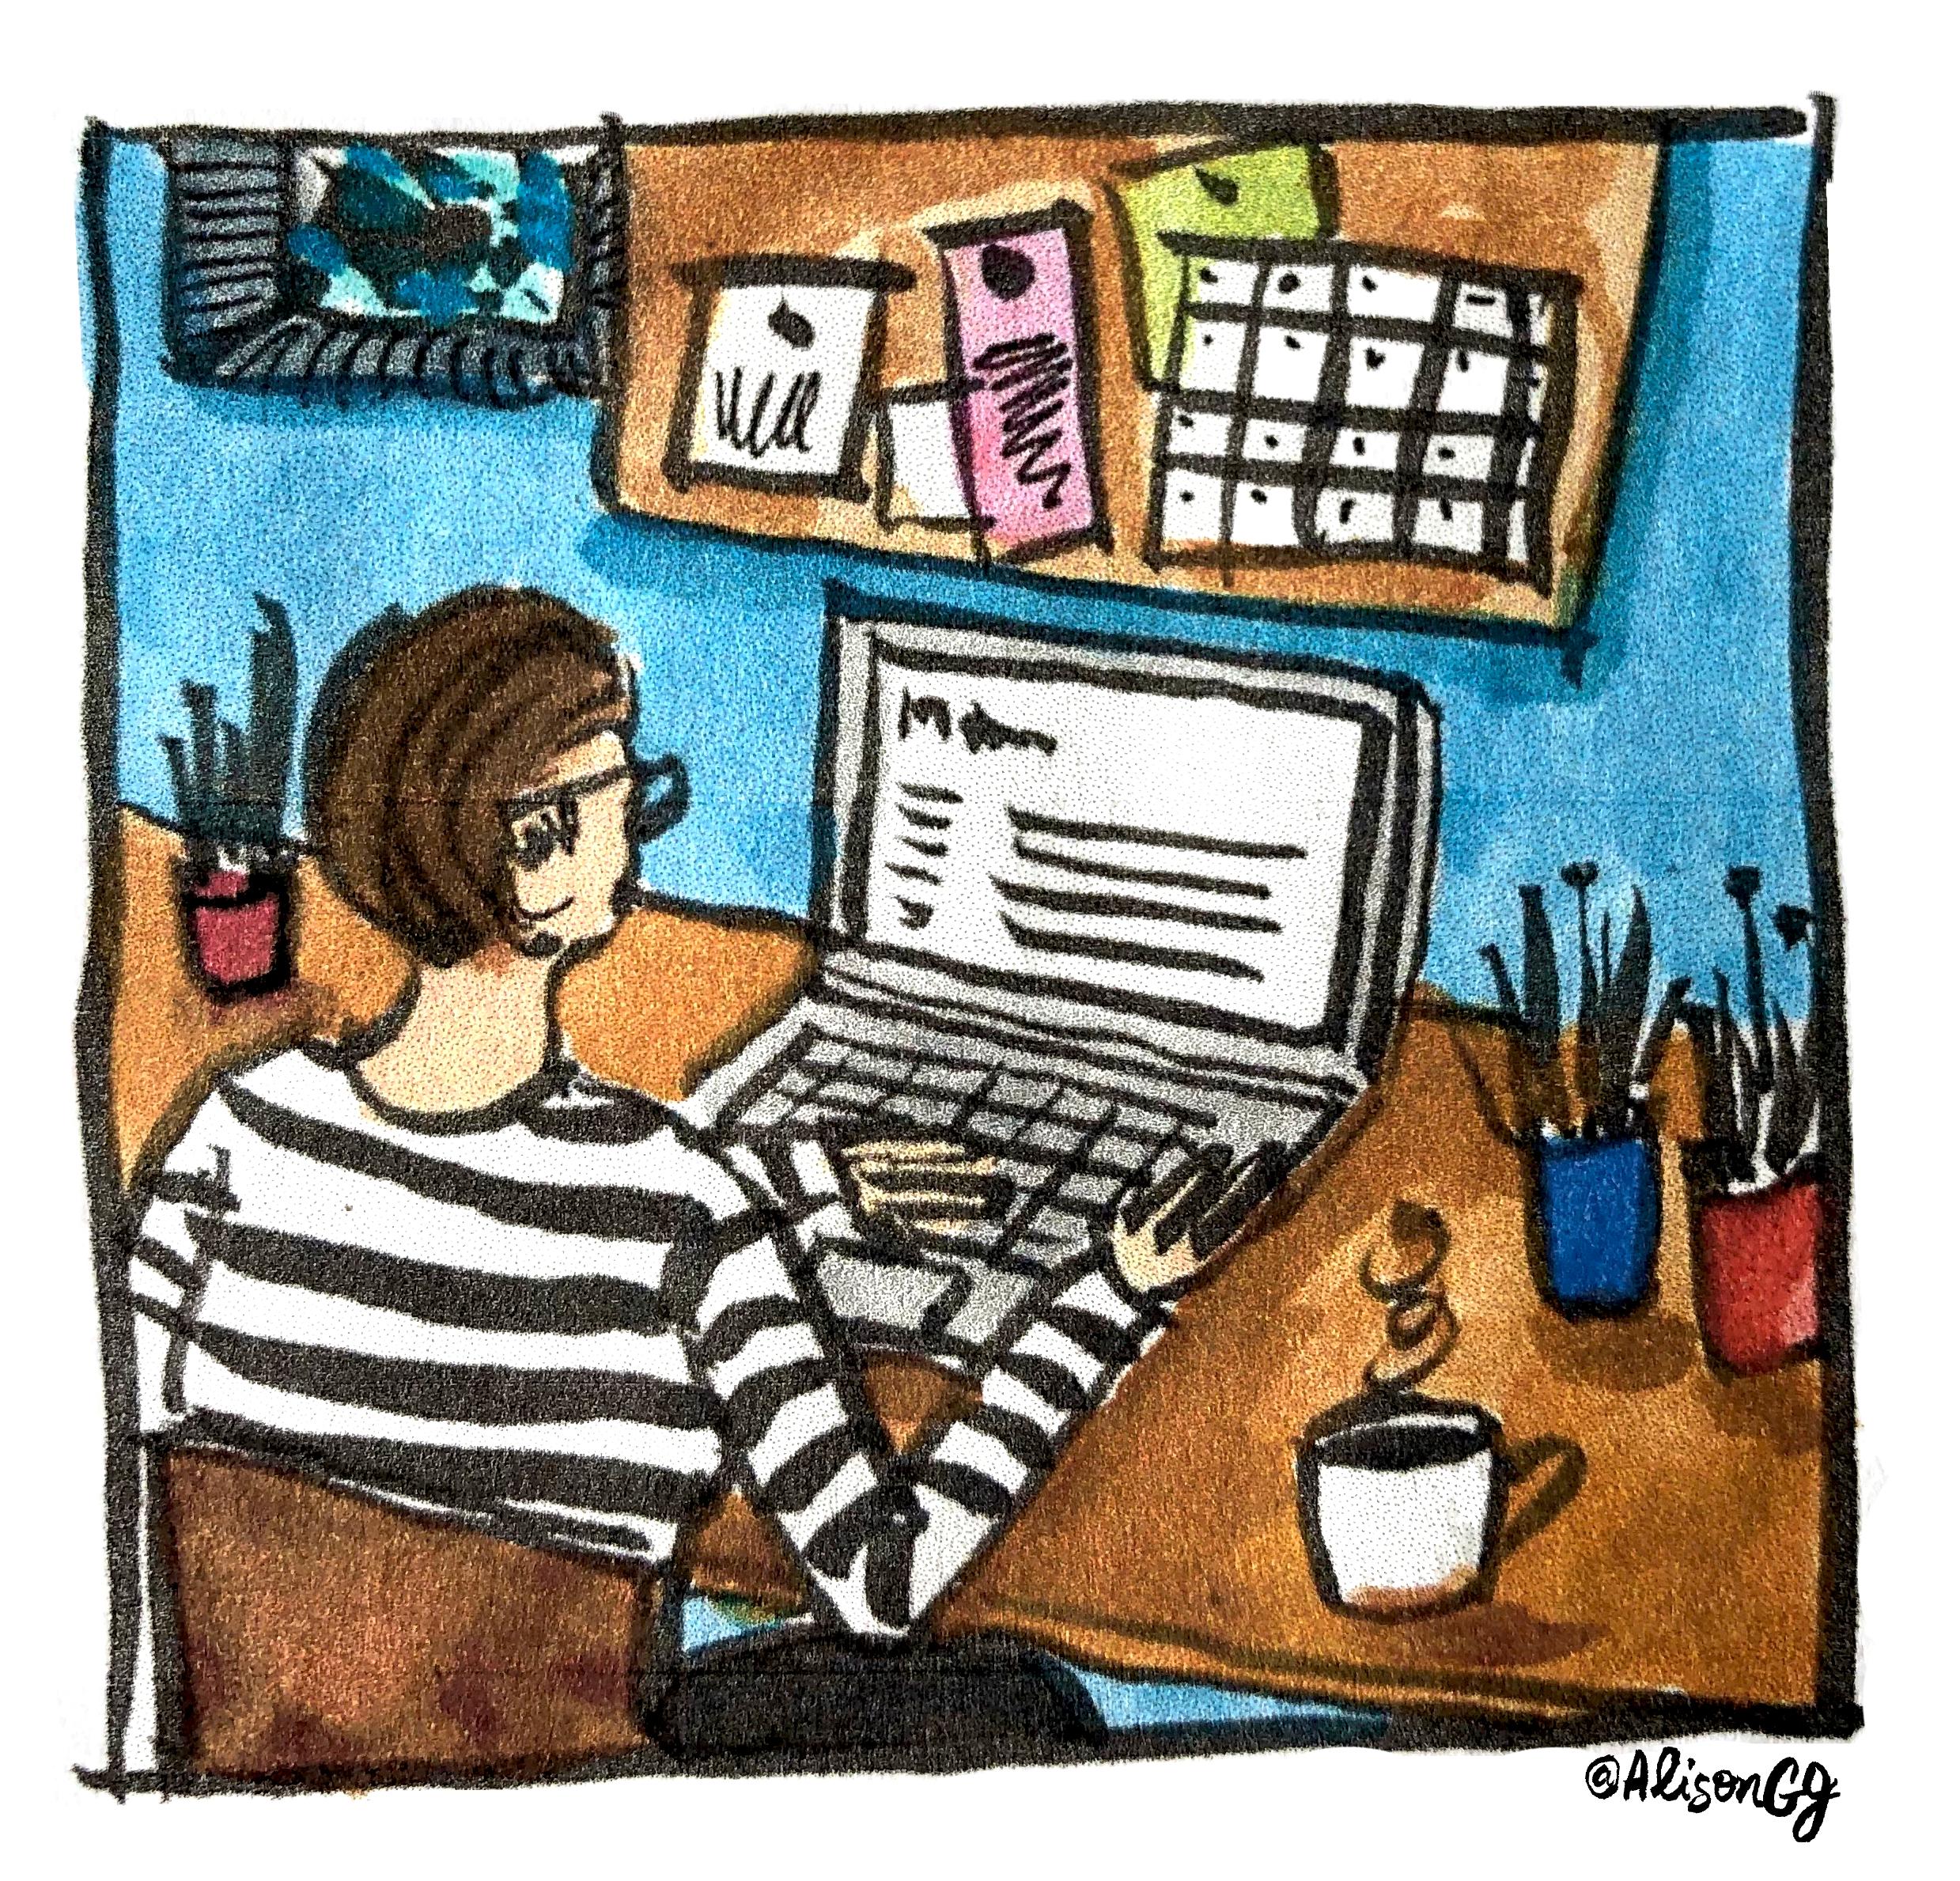 Alison Garwood-Jones at her desk